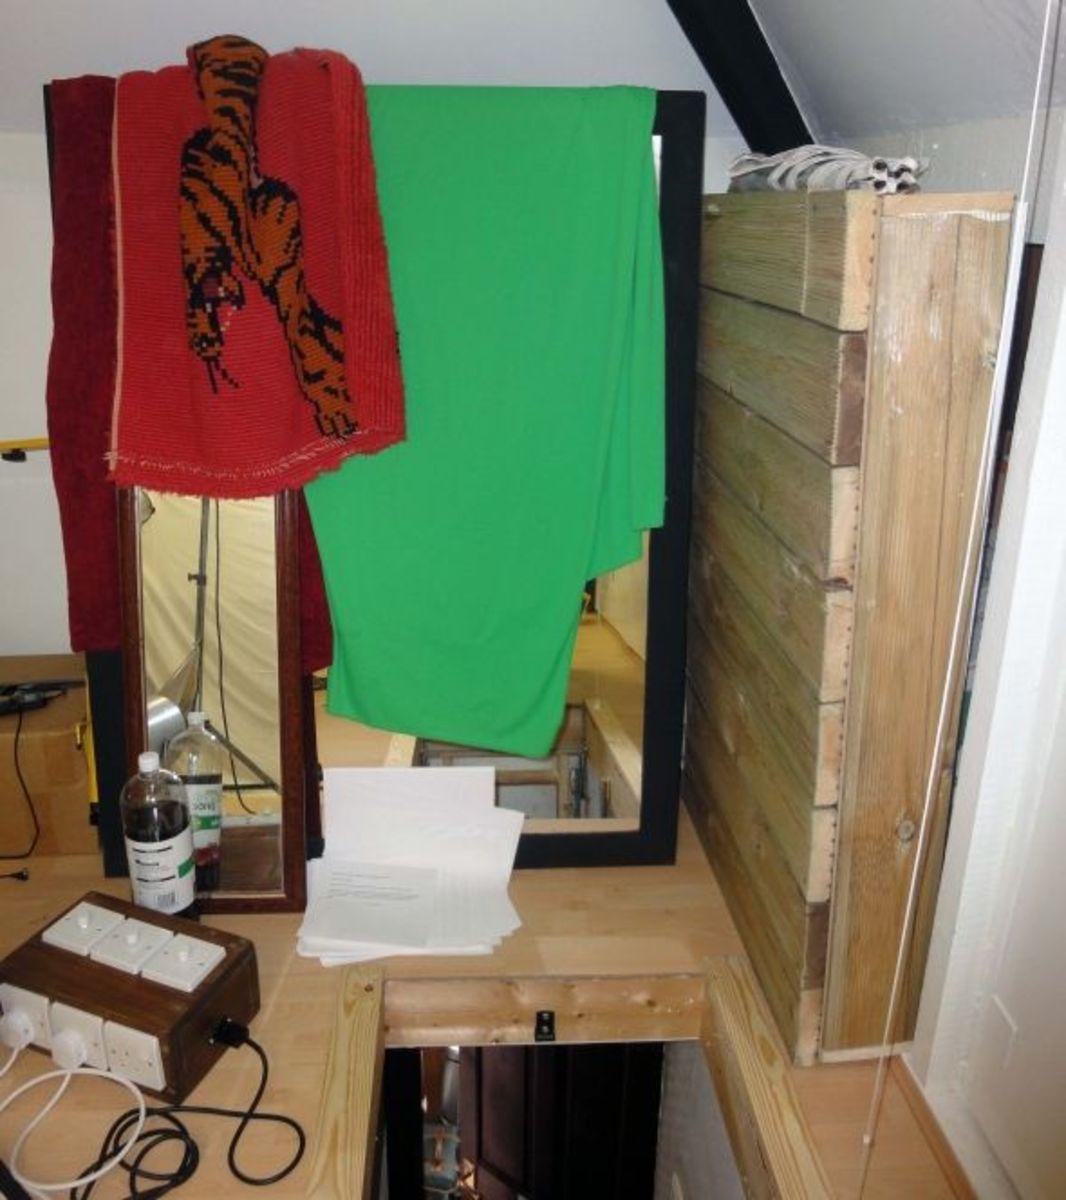 Studio Loft hatch over and mirror